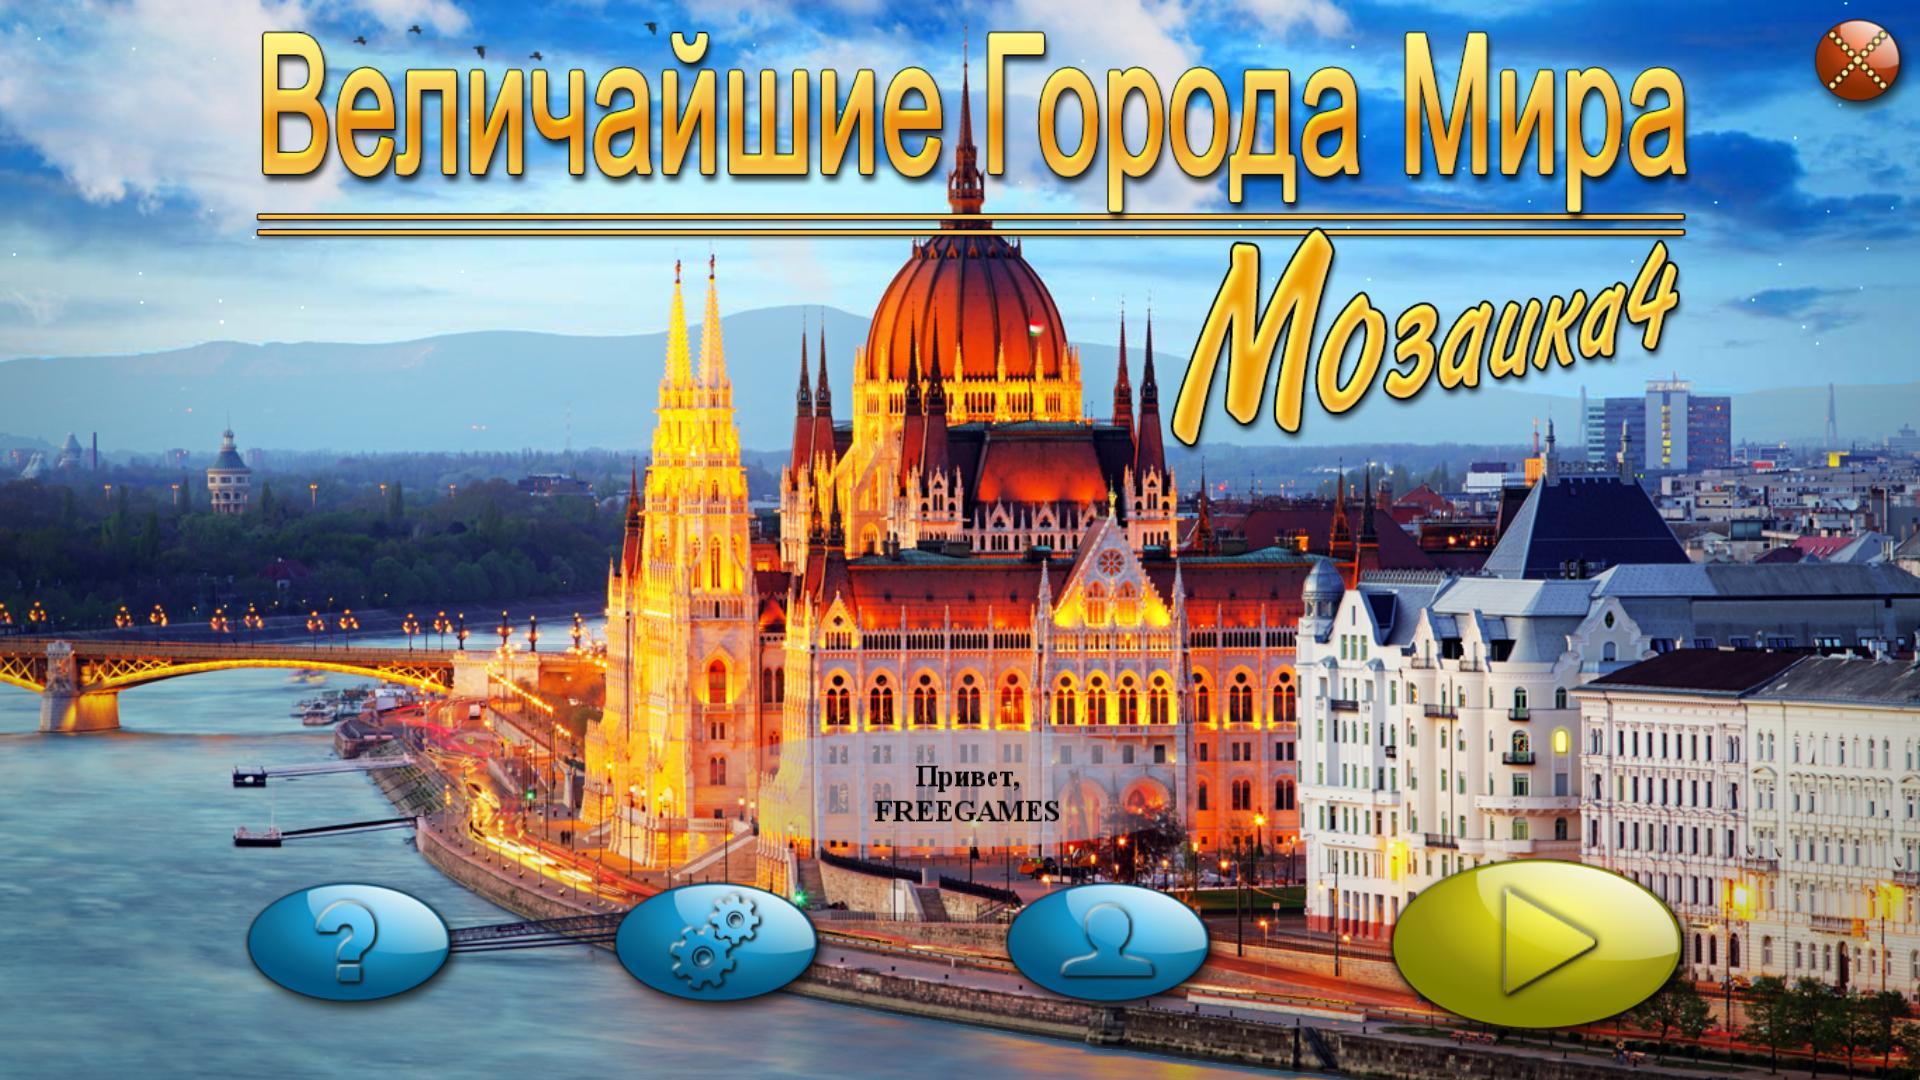 Величайшие города мира: Мозаика 4 | World's Greatest Cities Mosaics 4 (Rus)